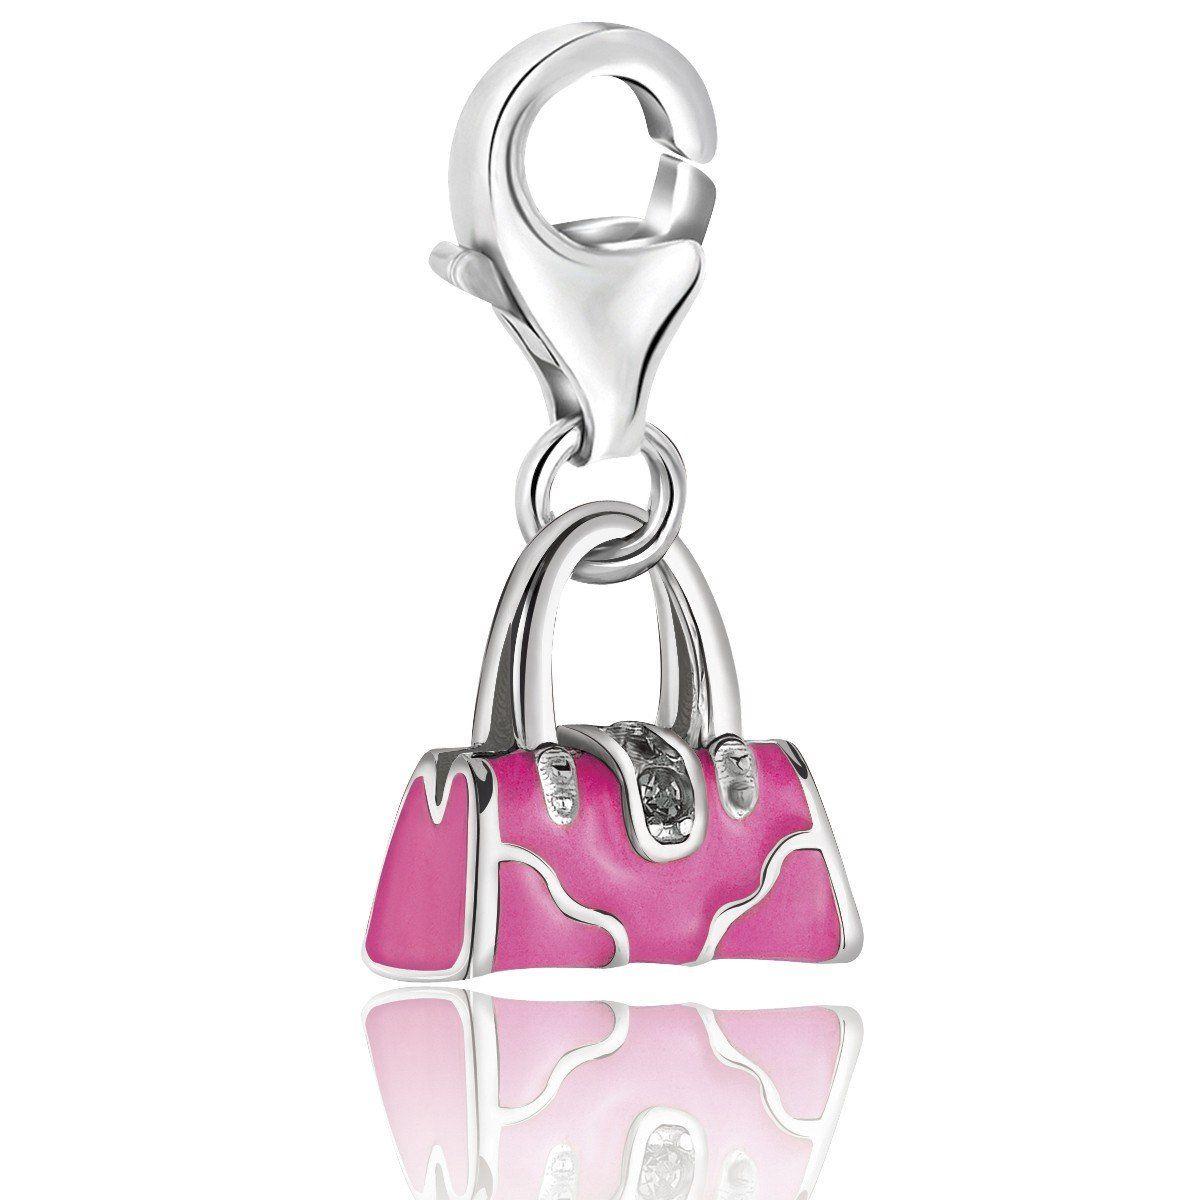 Sterling Silver Pink Enameled Handbag Charm With Crystal Lock Detailing